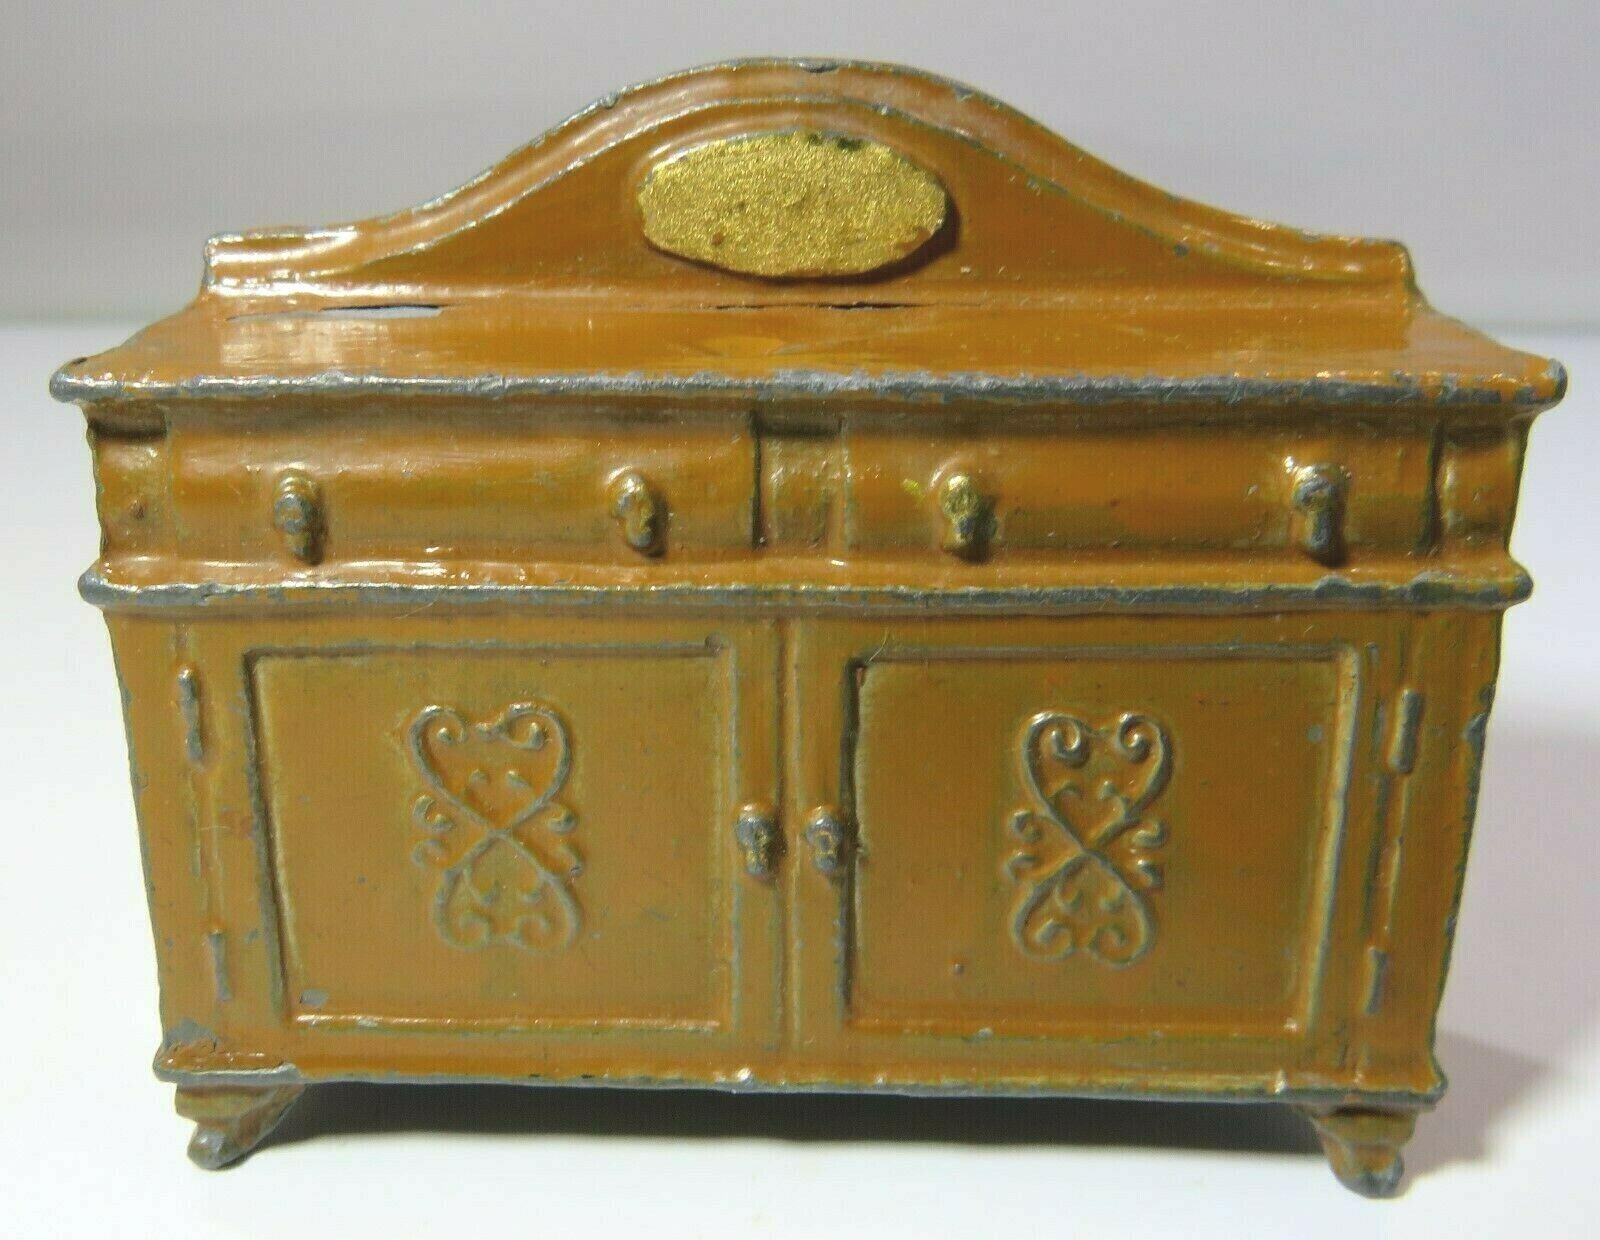 Vintage Dolls House Miniature Metal Hollowcast Sideboard Dresser Cupboard